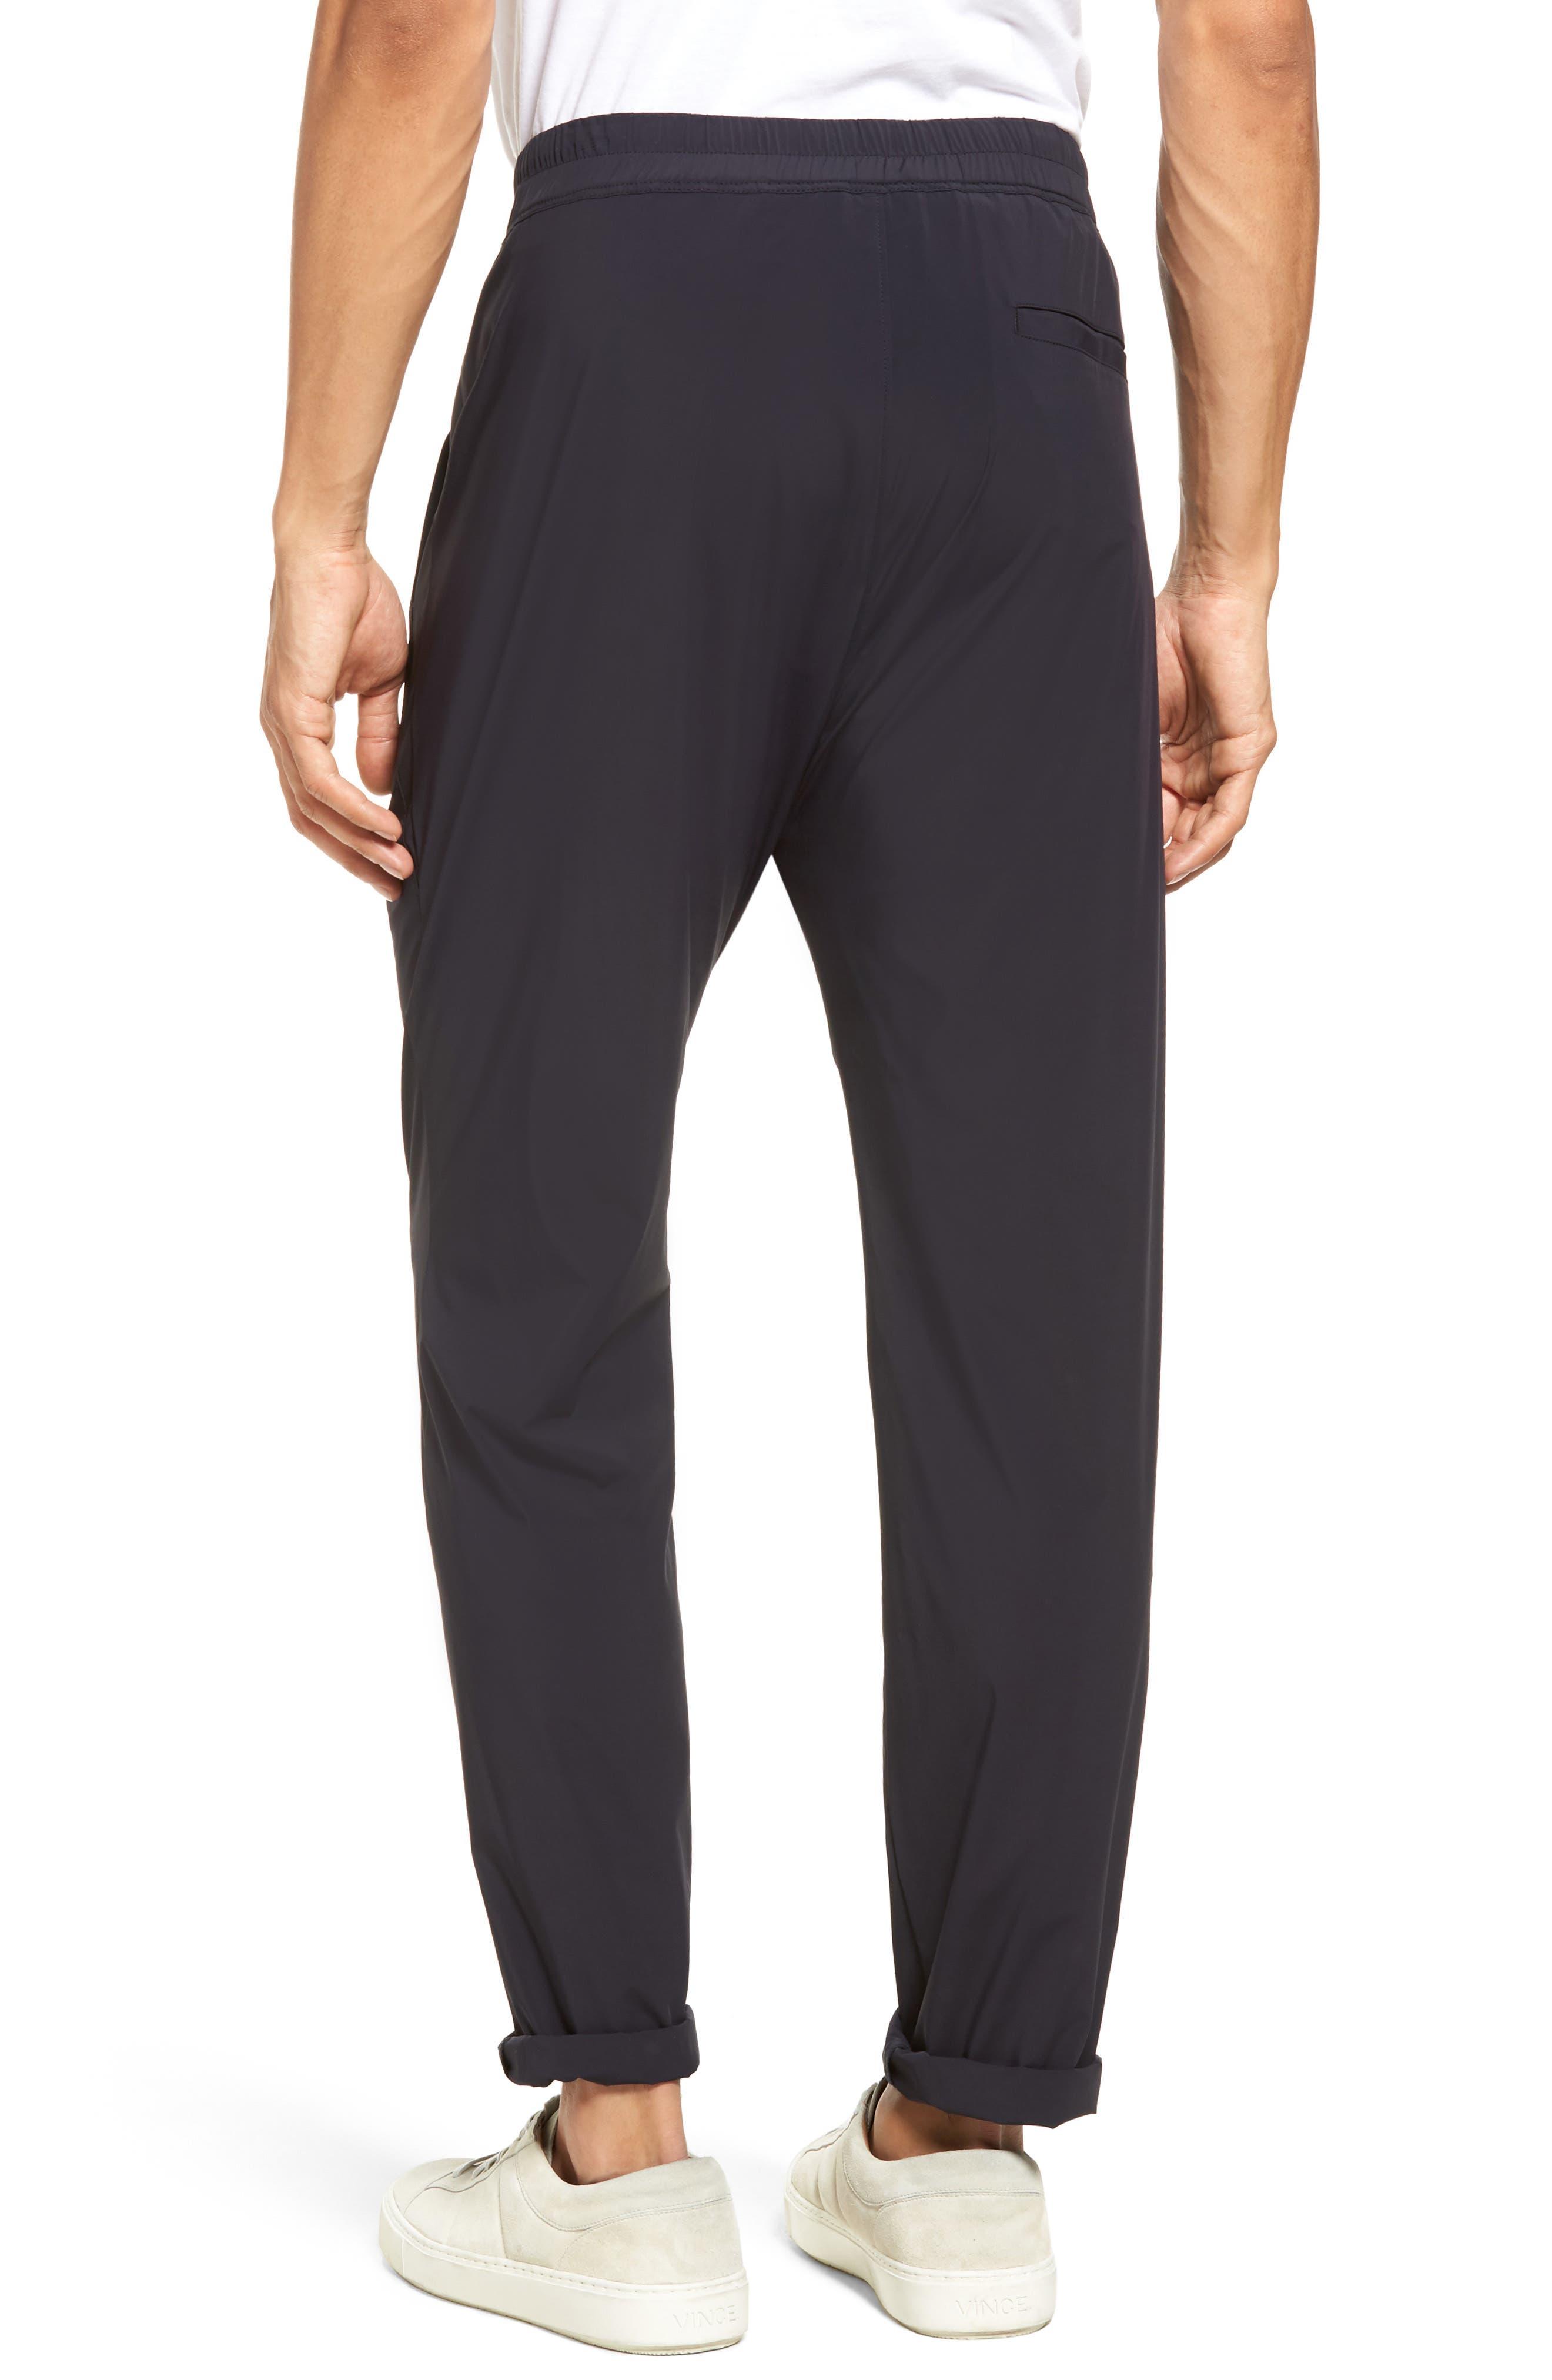 Drop Crotch Jogger Pants,                             Alternate thumbnail 2, color,                             001